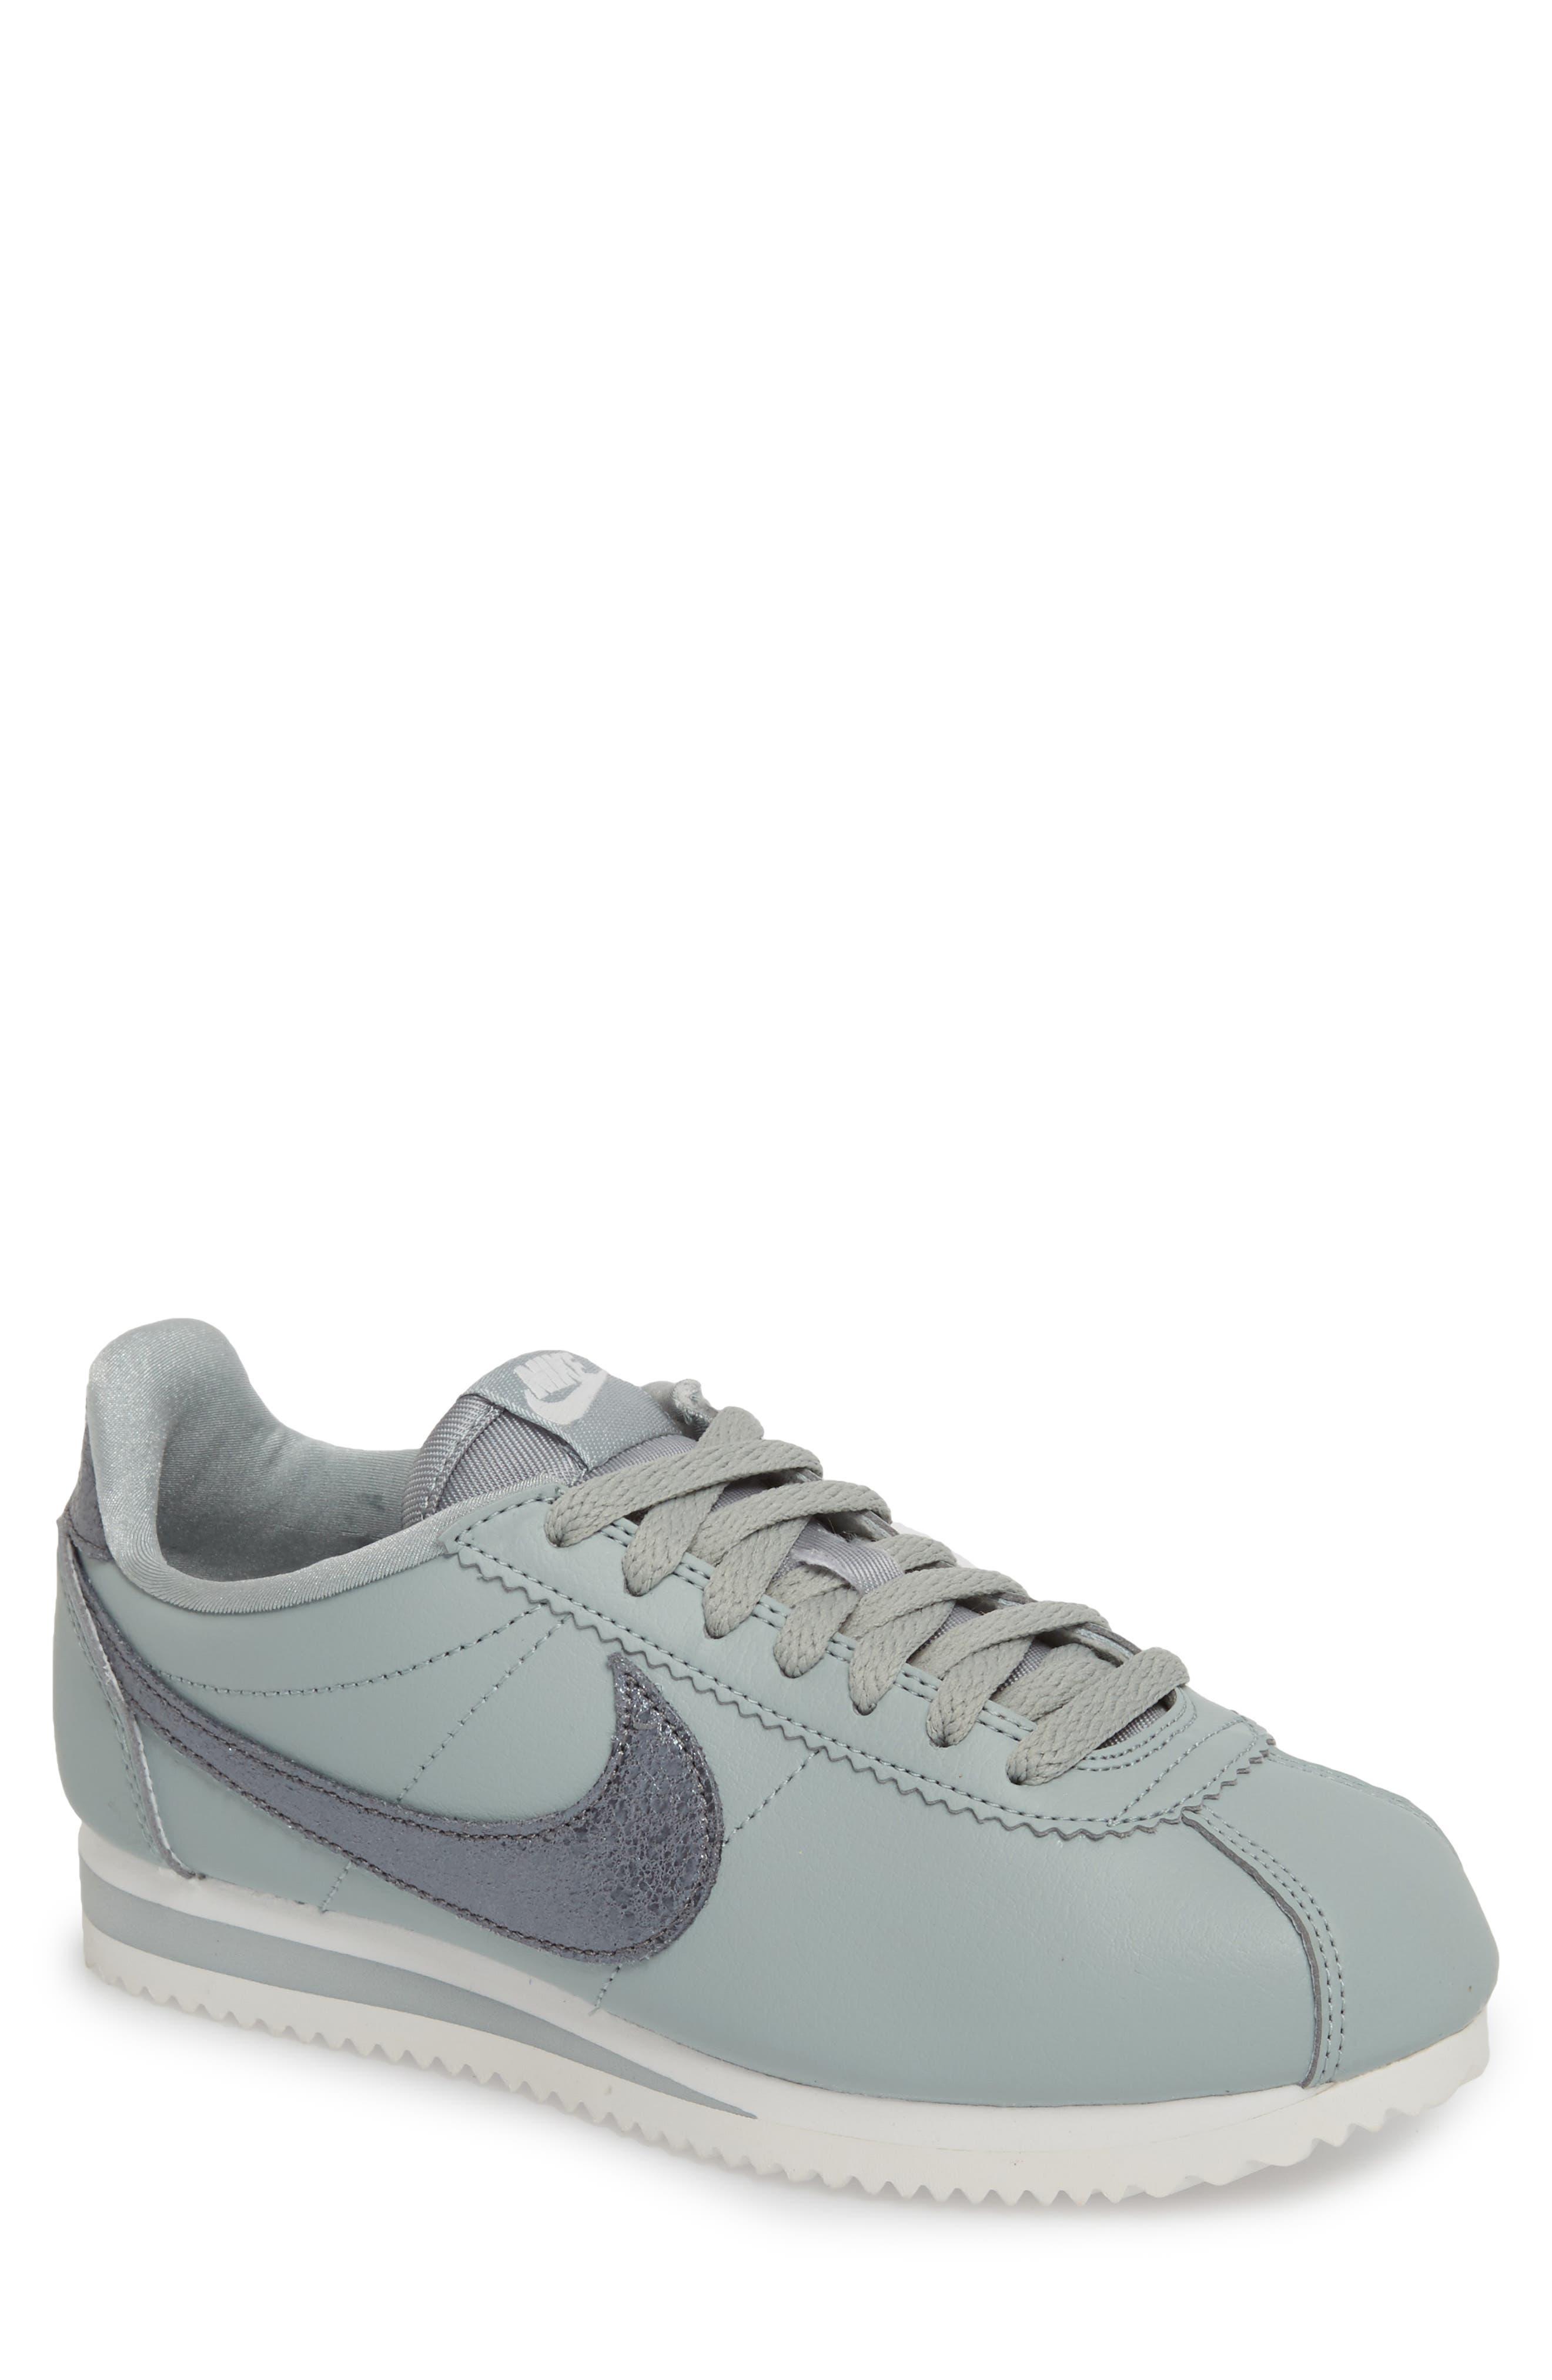 Factory Sale Cortez Running Shoe Women Womens Black/ Black/ Sail/ Gum/ Brown Nike Womens Style on a Shoestring Shoe Steals